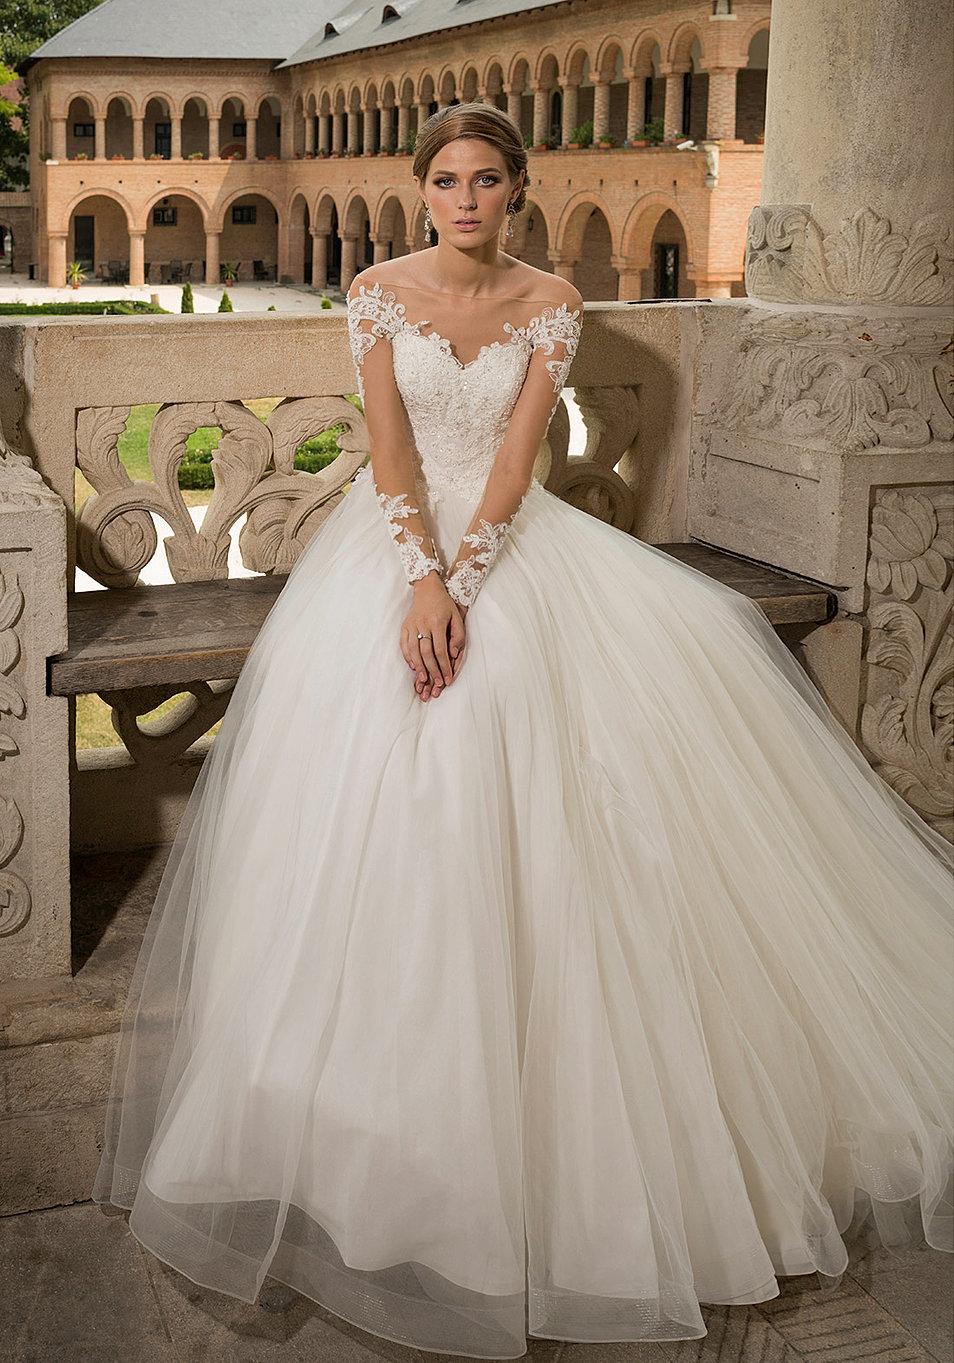 bien savvy luxury wedding dresses luxury wedding dress bien savvy addicted to stage 2